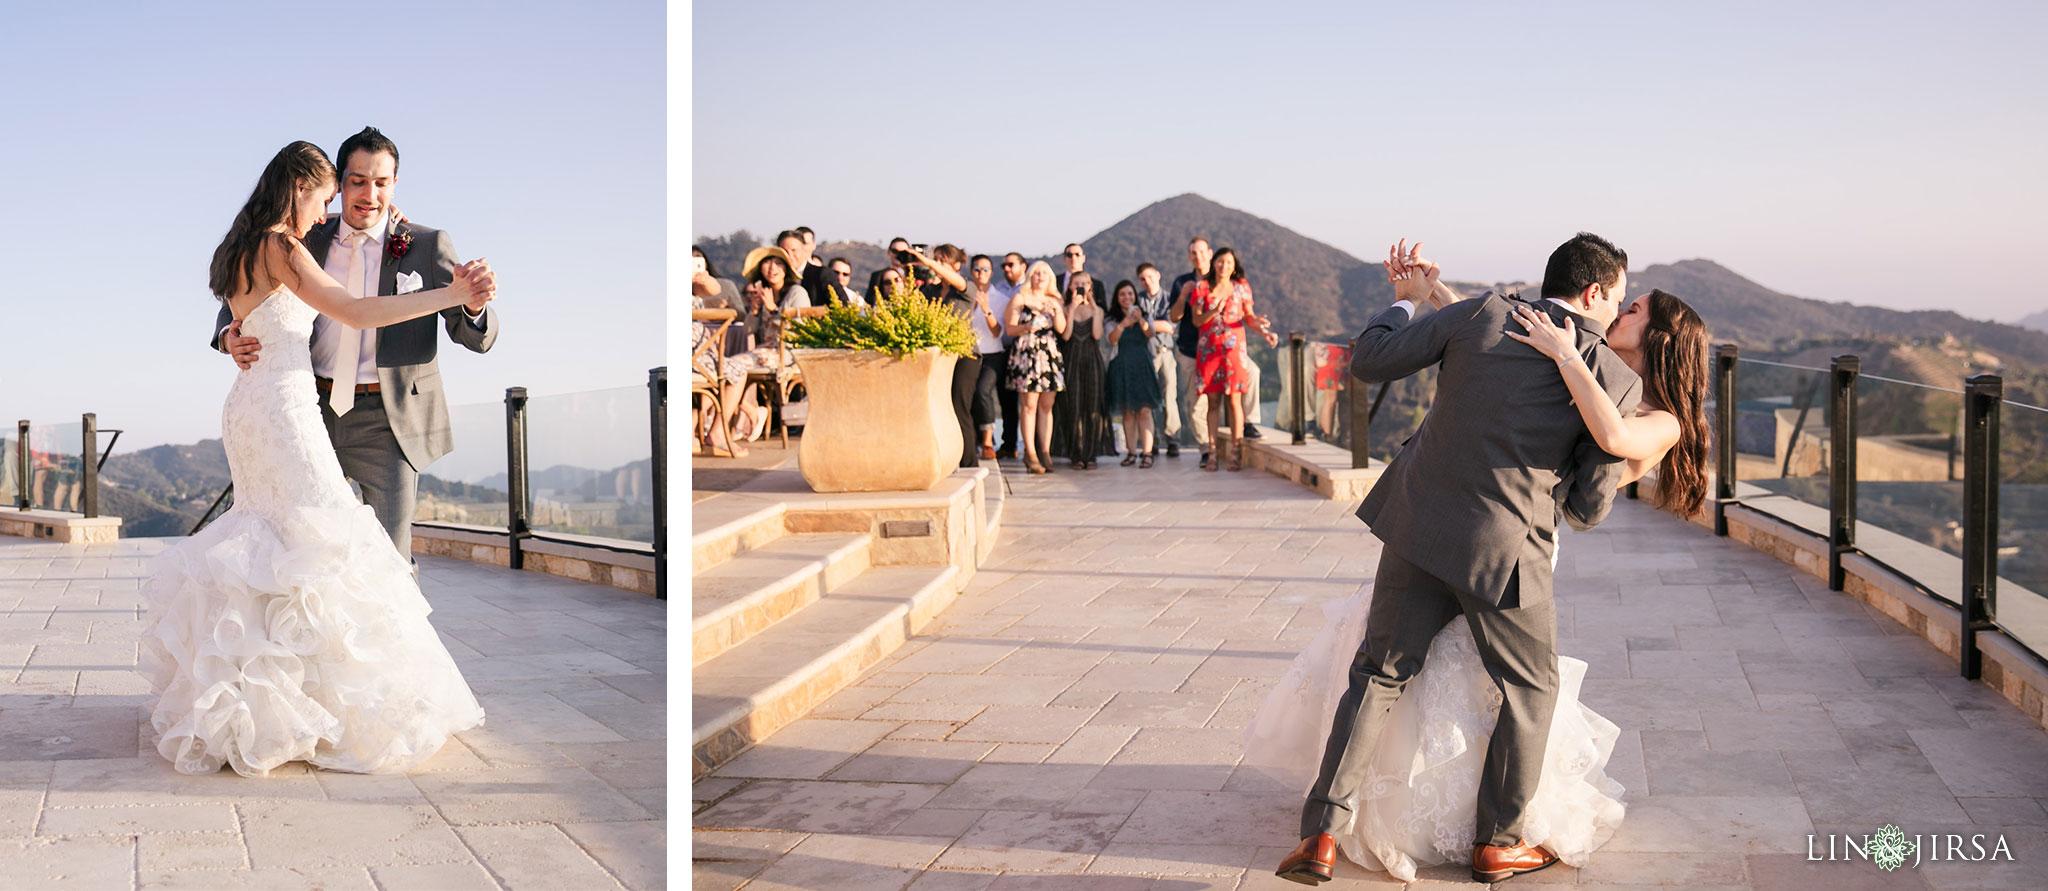 030 malibu rocky oaks wedding photography